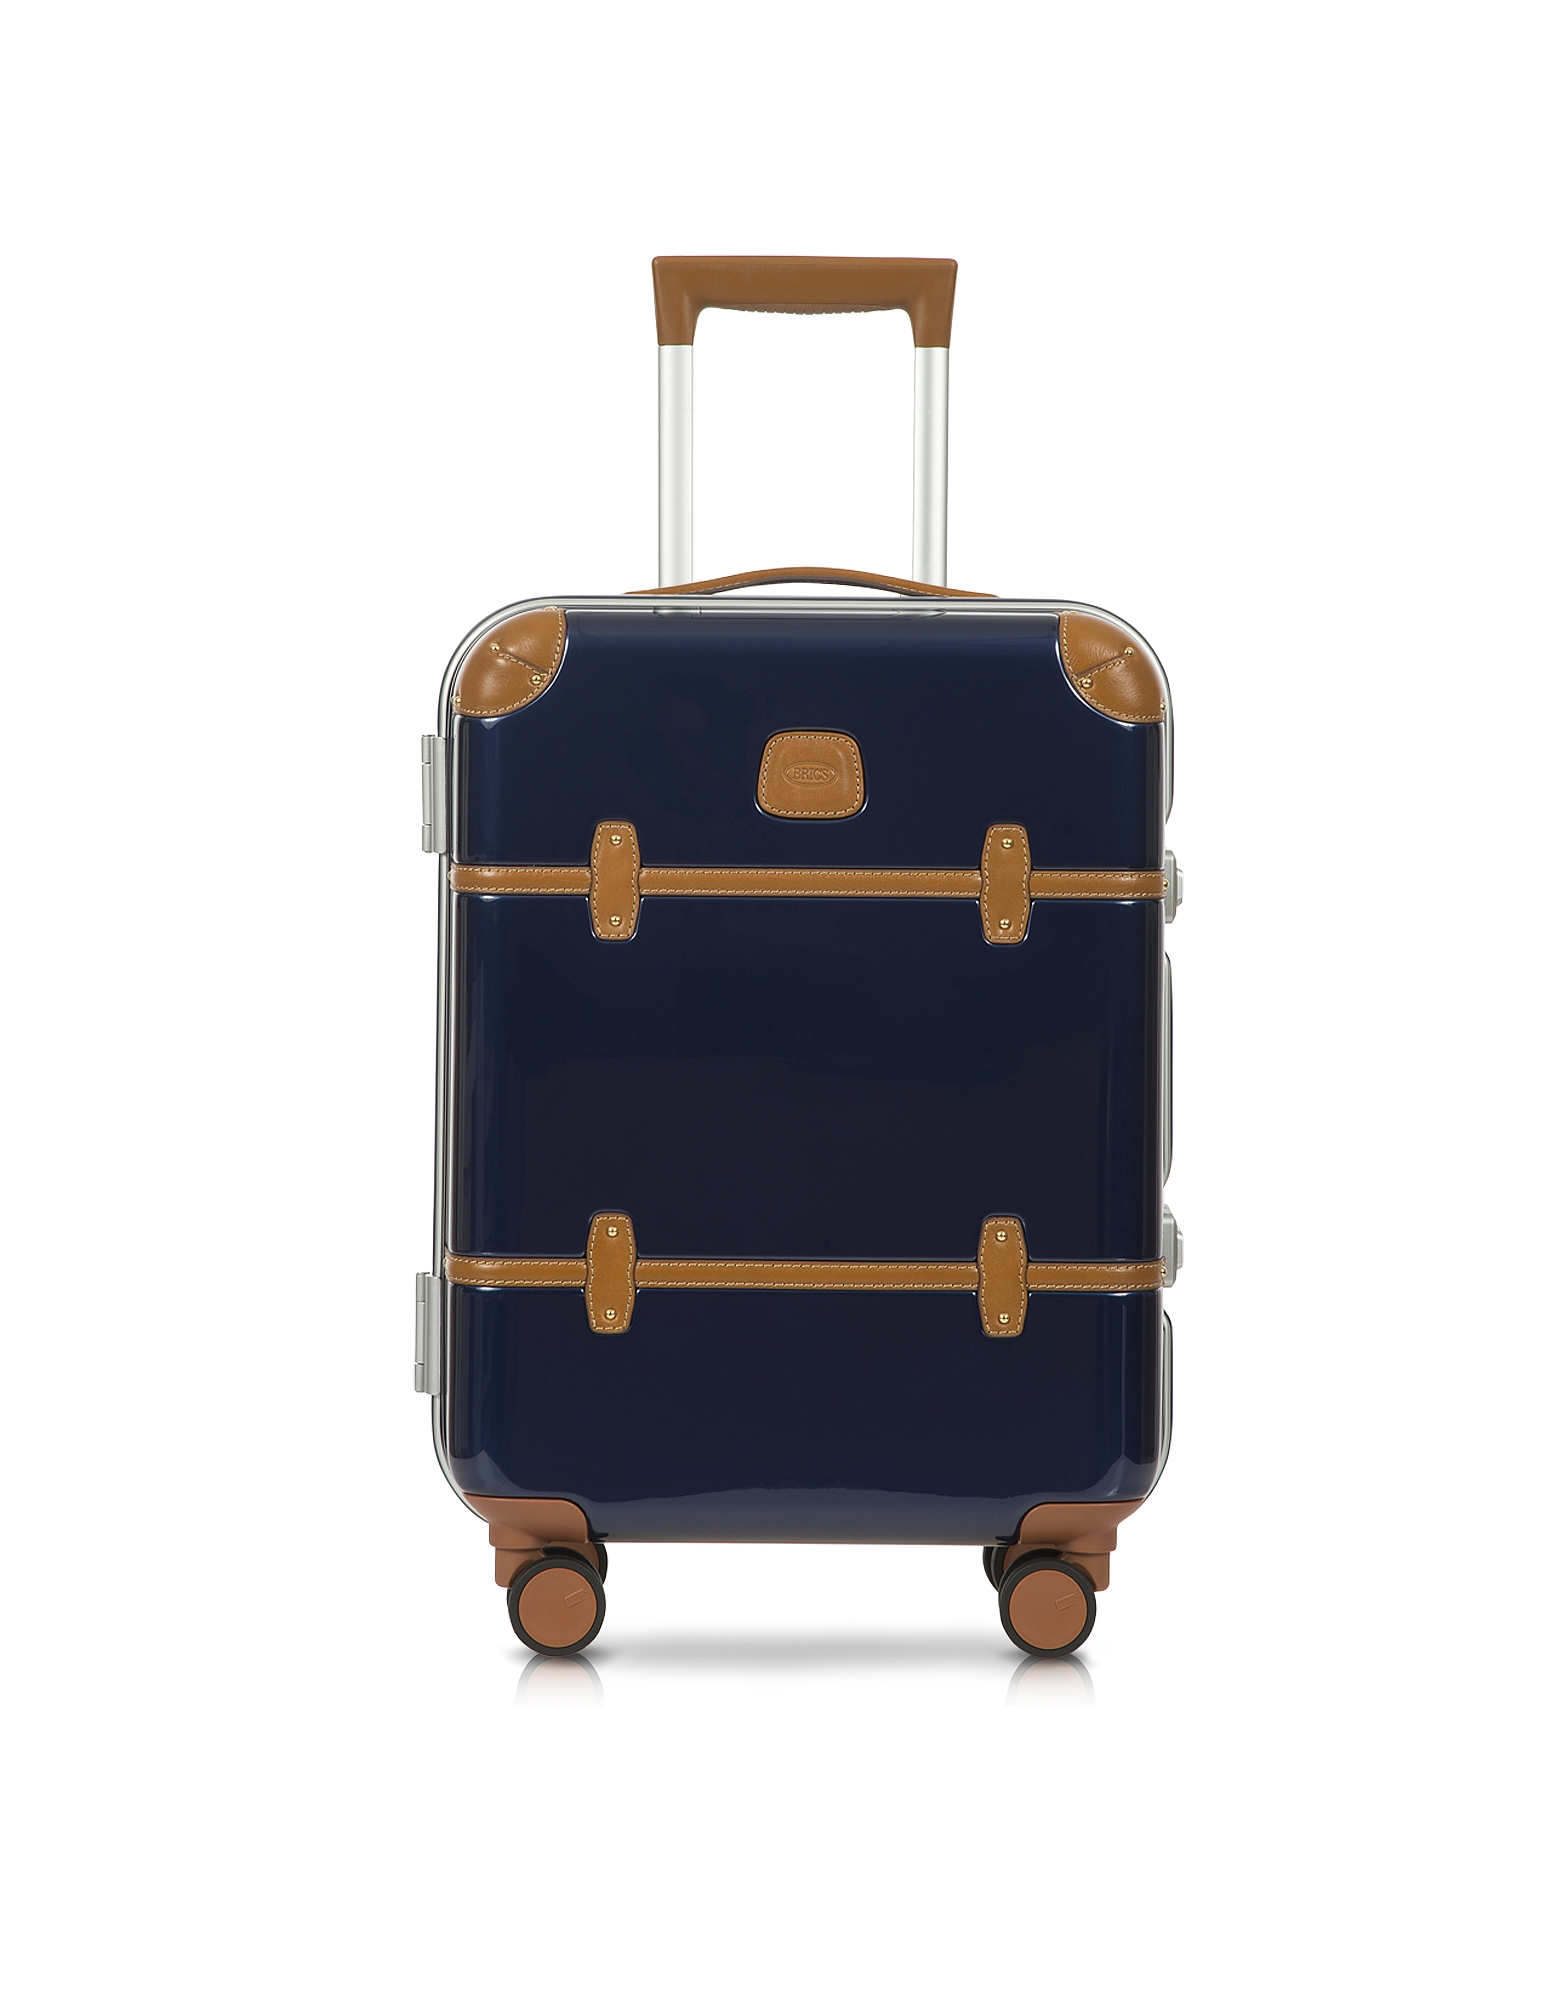 Bellagio Metallo V2.0 - Синий Чемодан Ручная Кладь 21″ на Колесиках